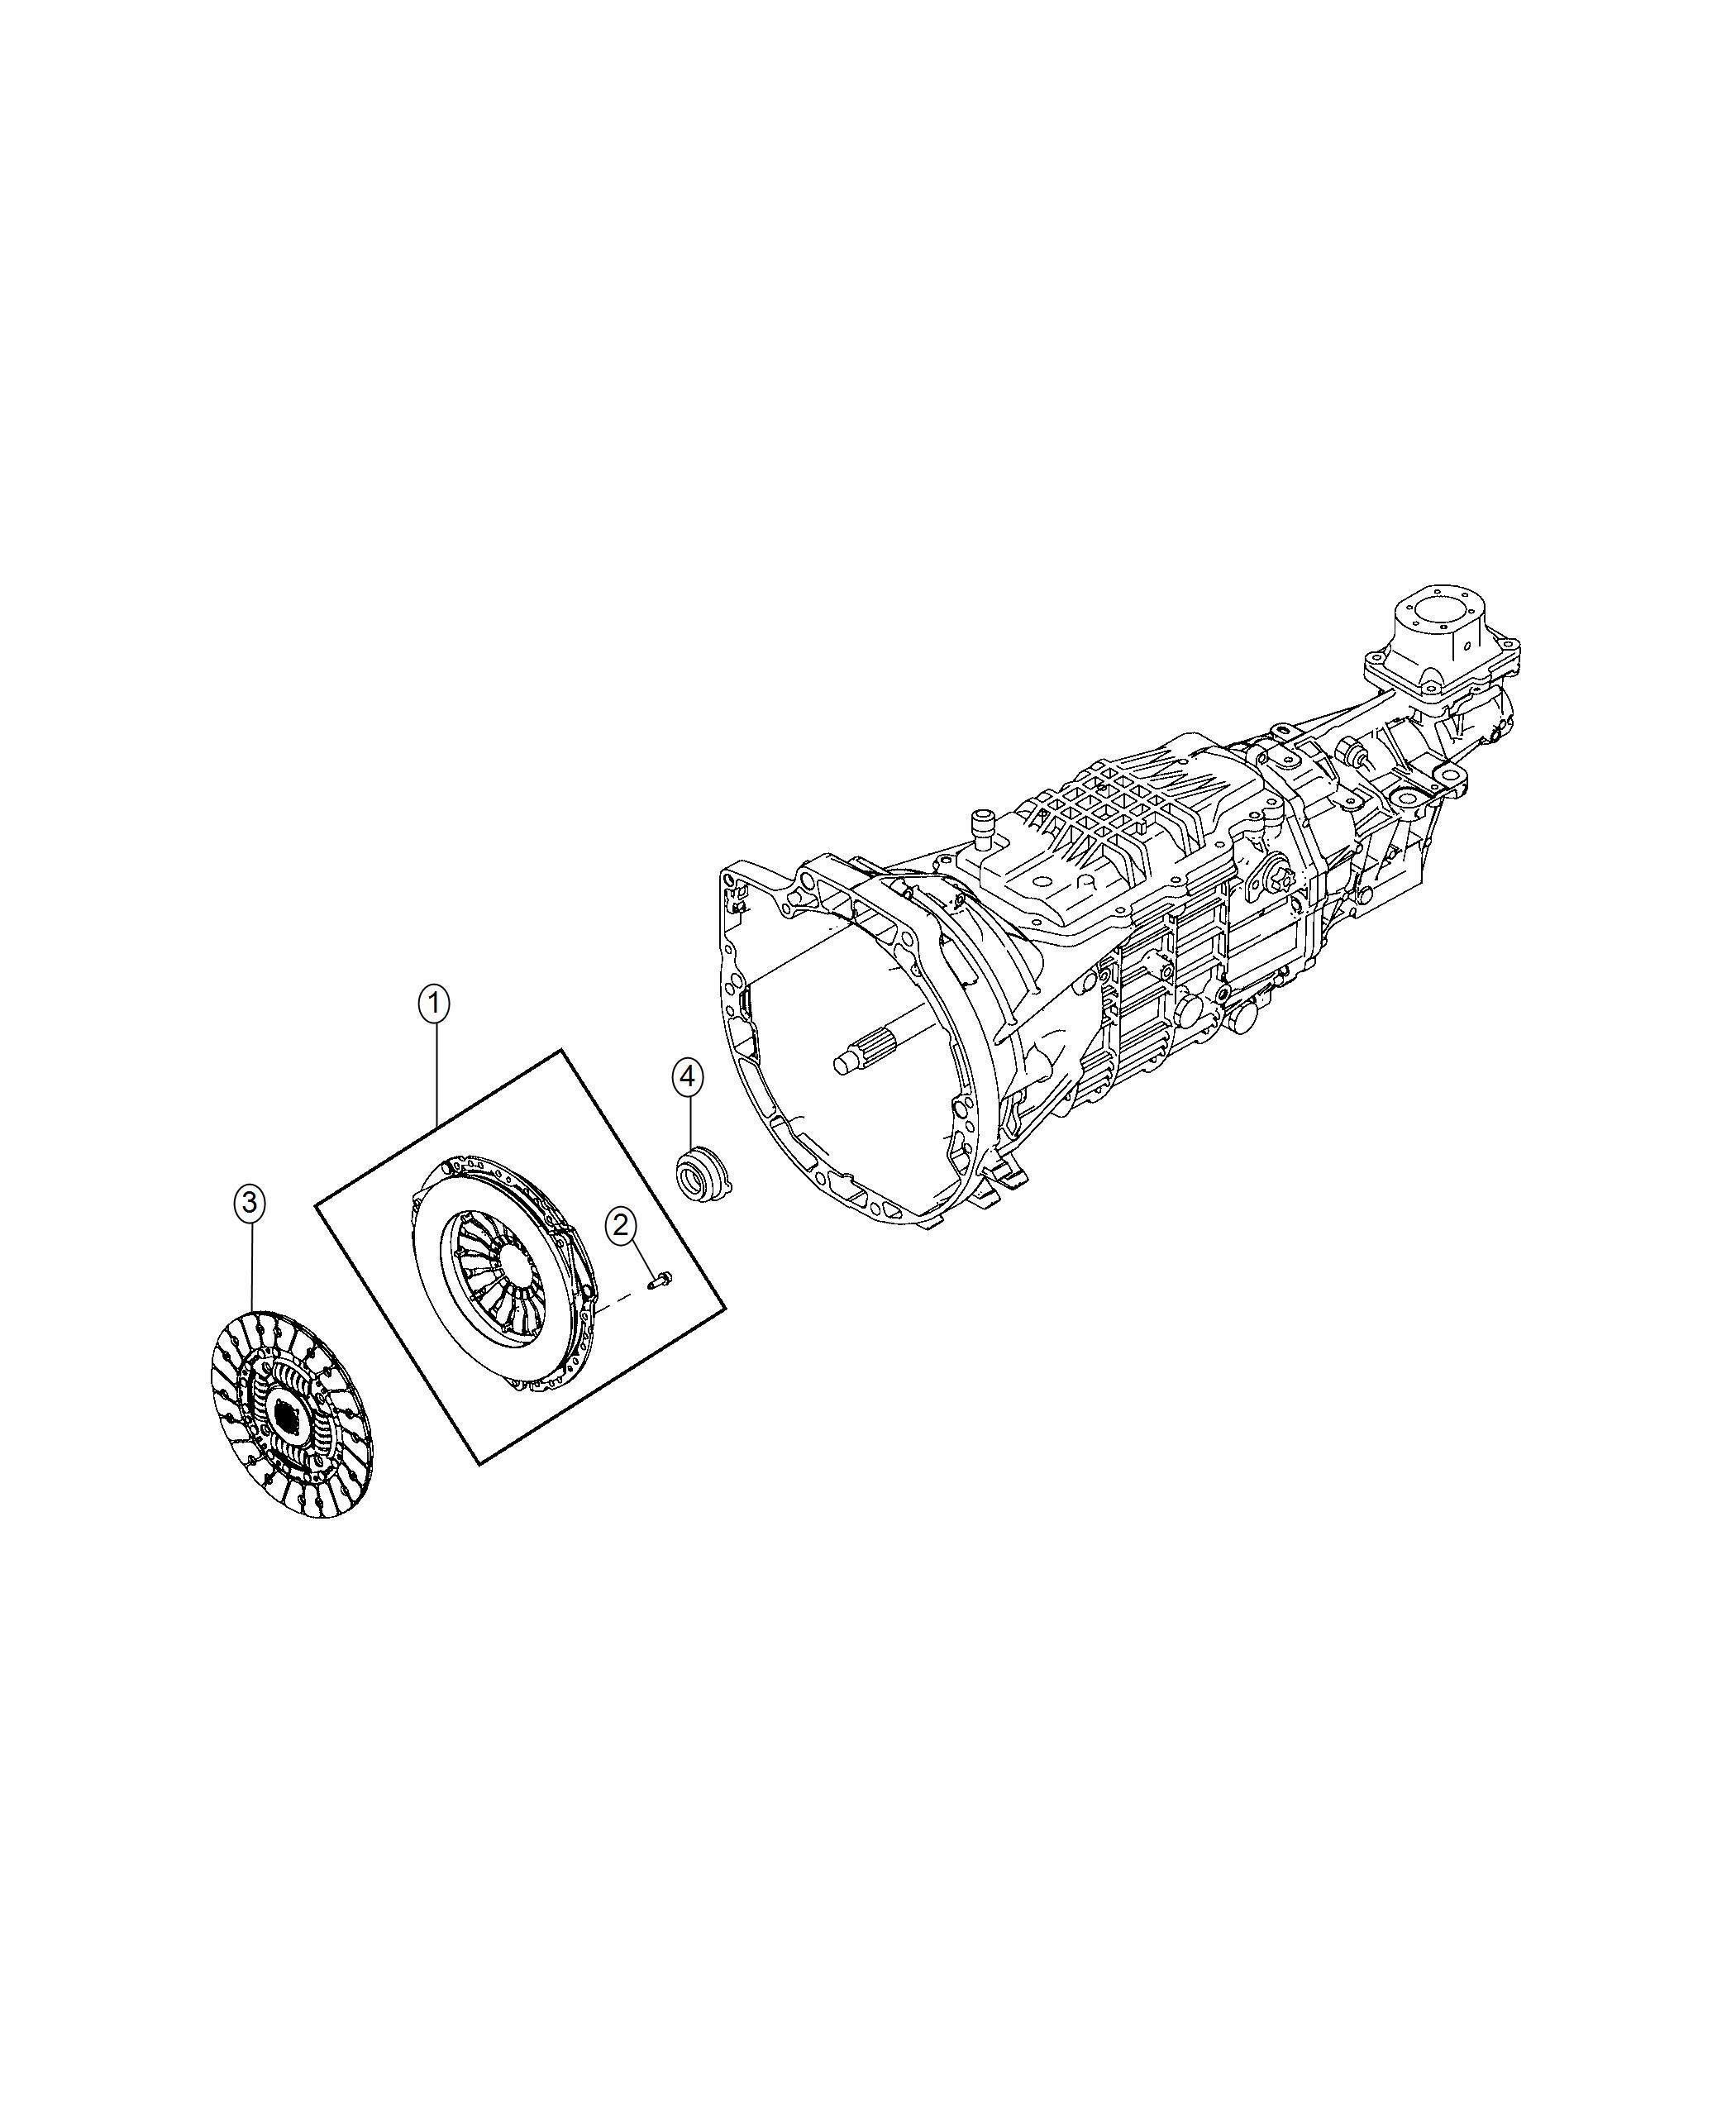 2018 Fiat SPIDER Bearing. Clutch release. Maintenance